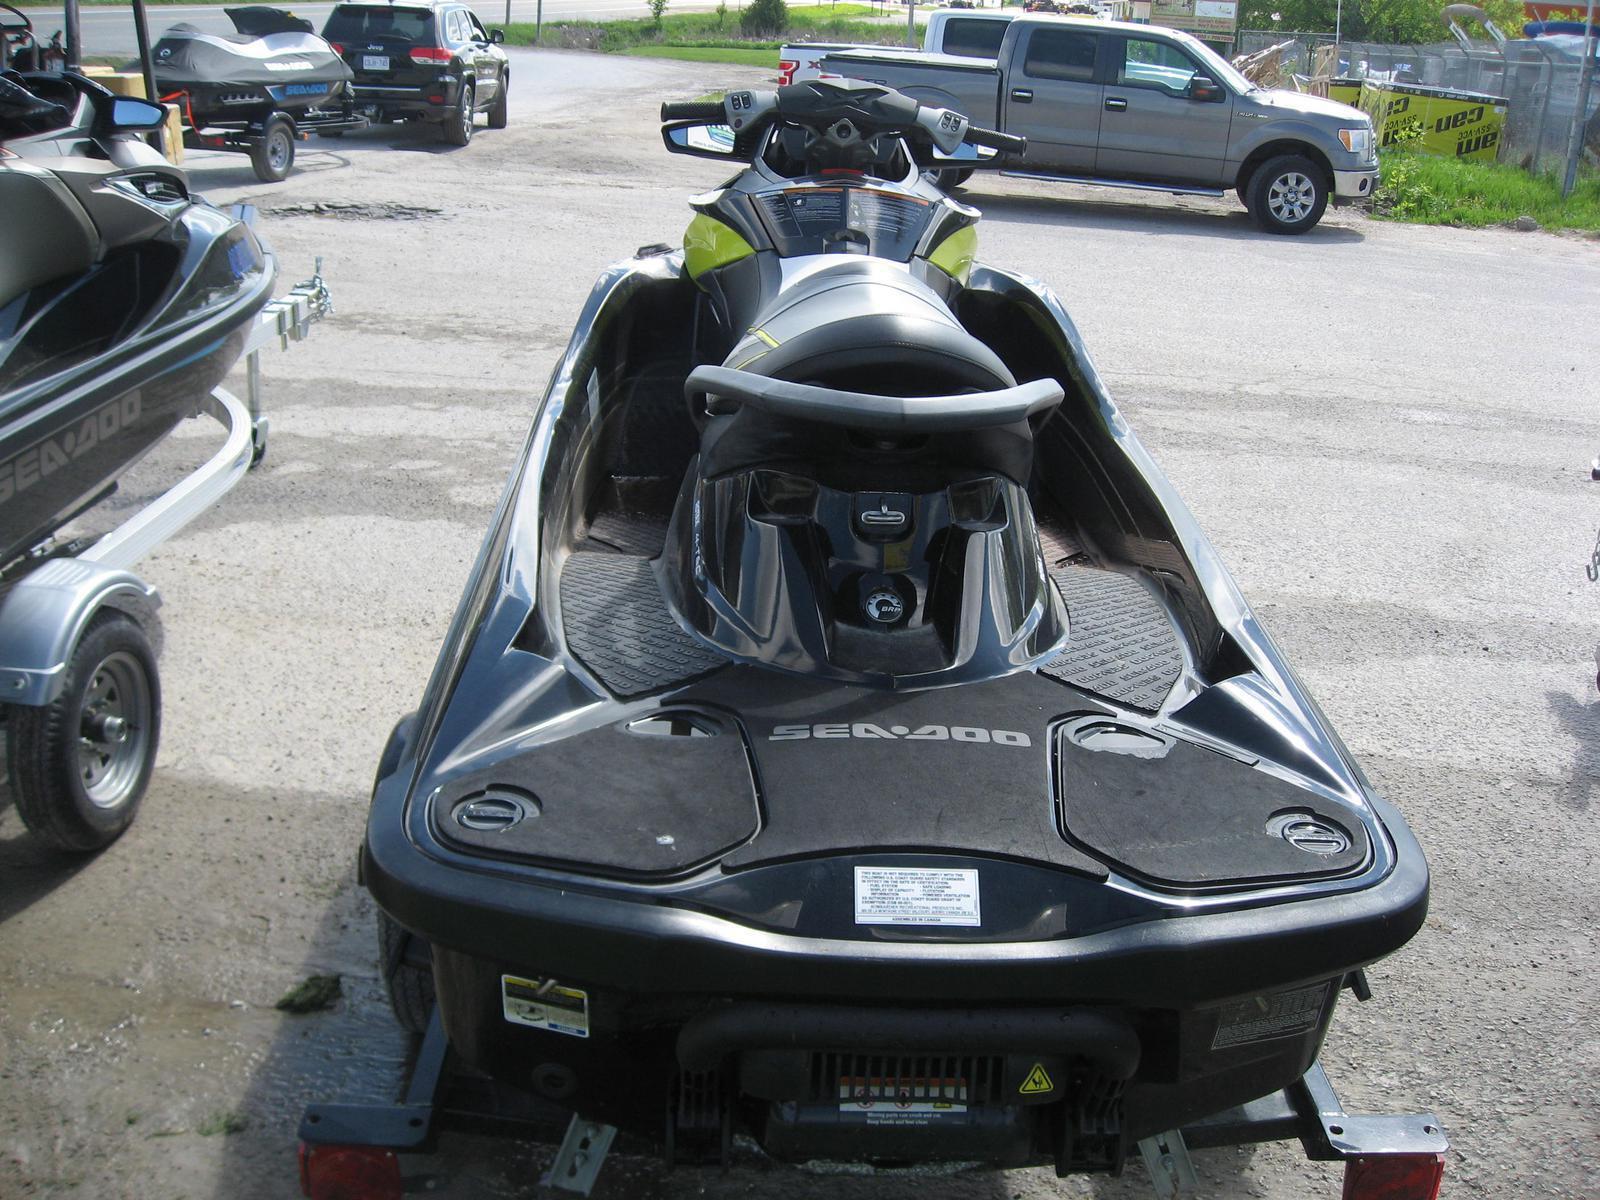 2012 Sea-Doo RXT-X260